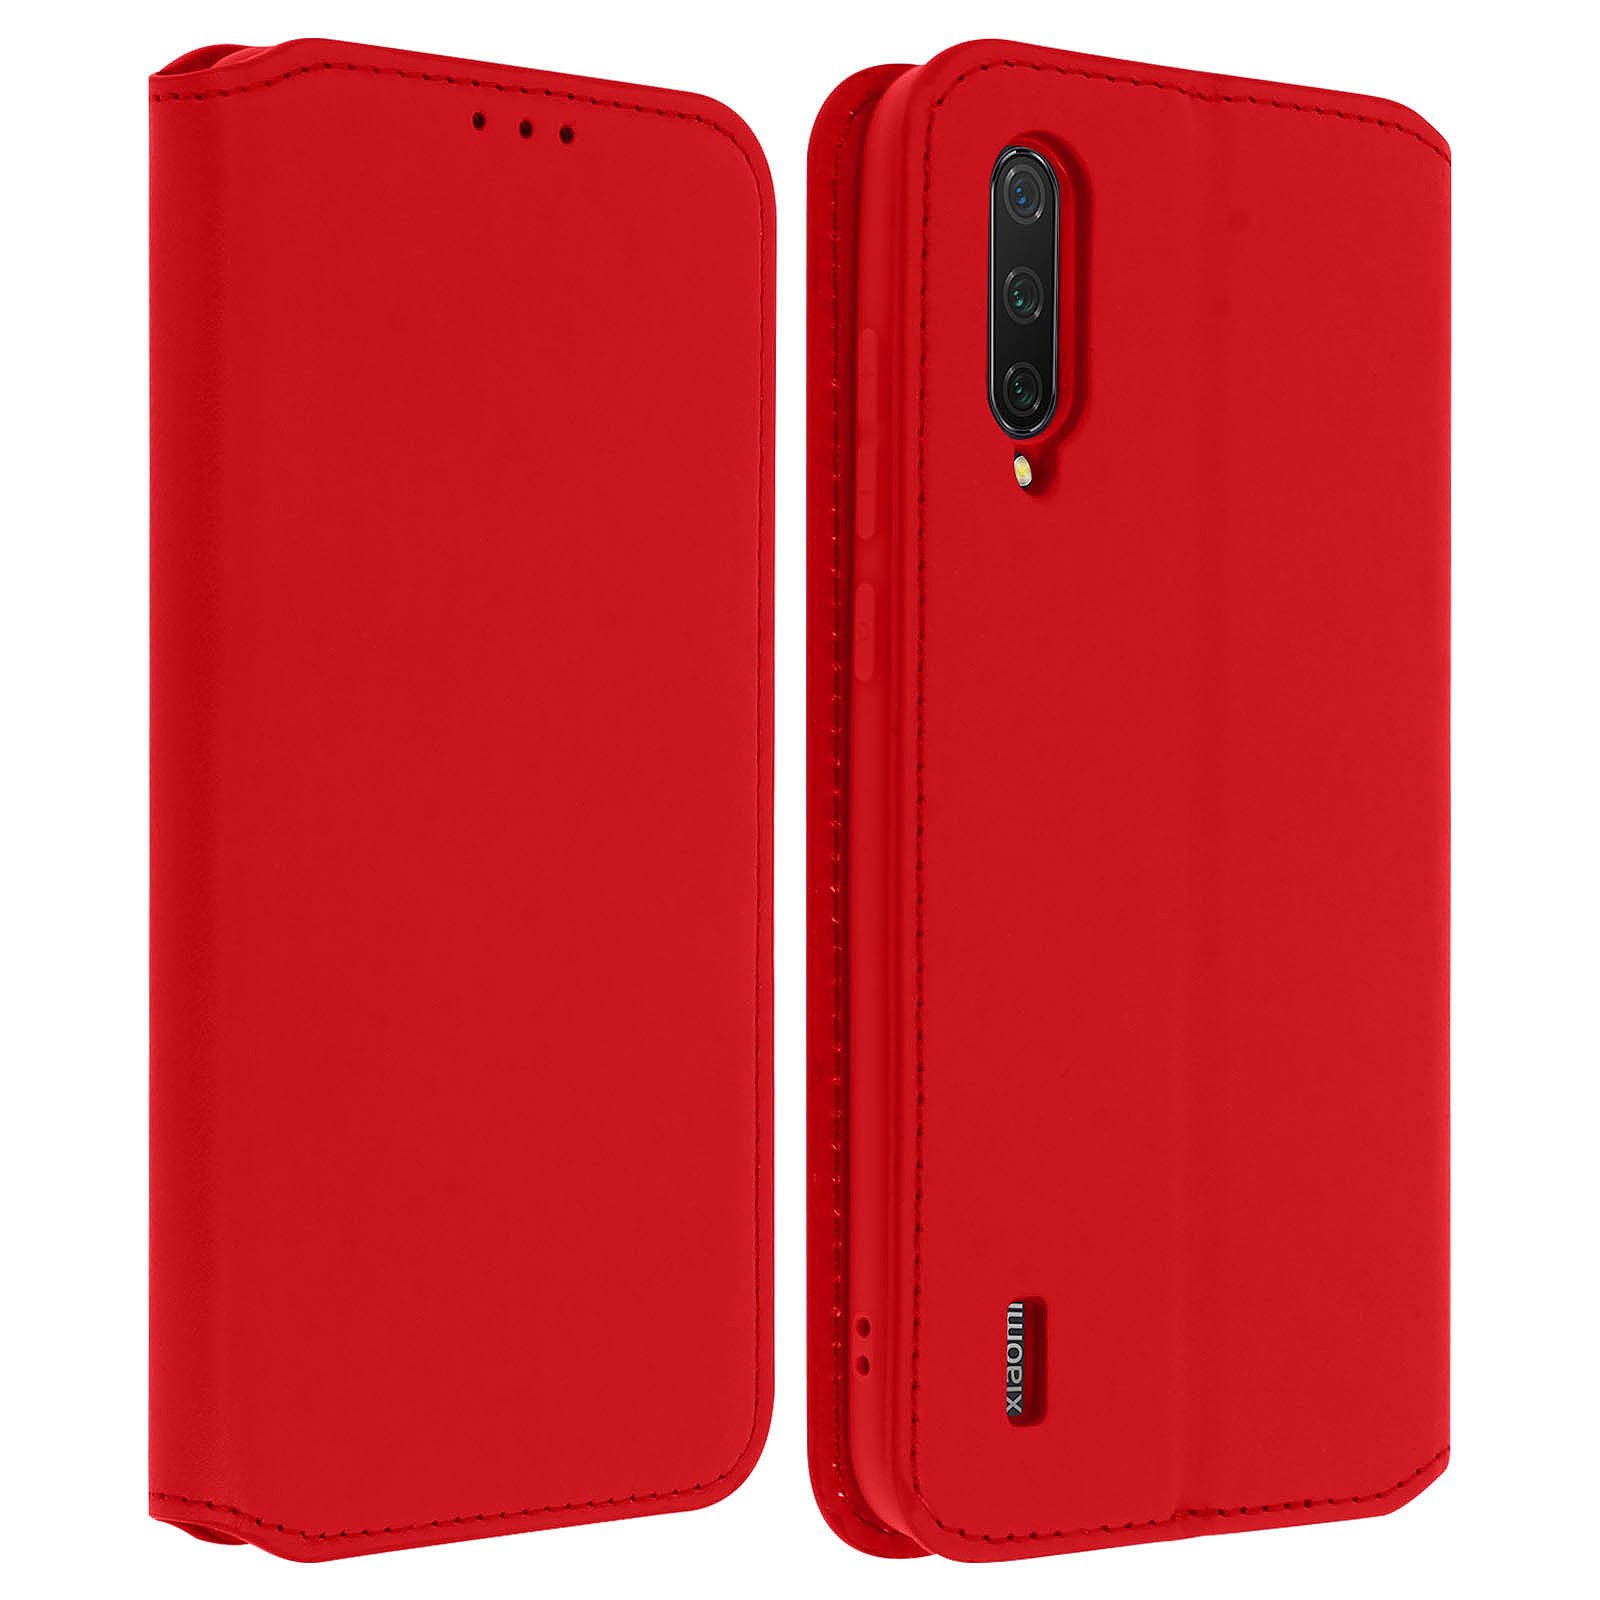 Avizar Etui folio Rouge pour Xiaomi Mi 9 Lite